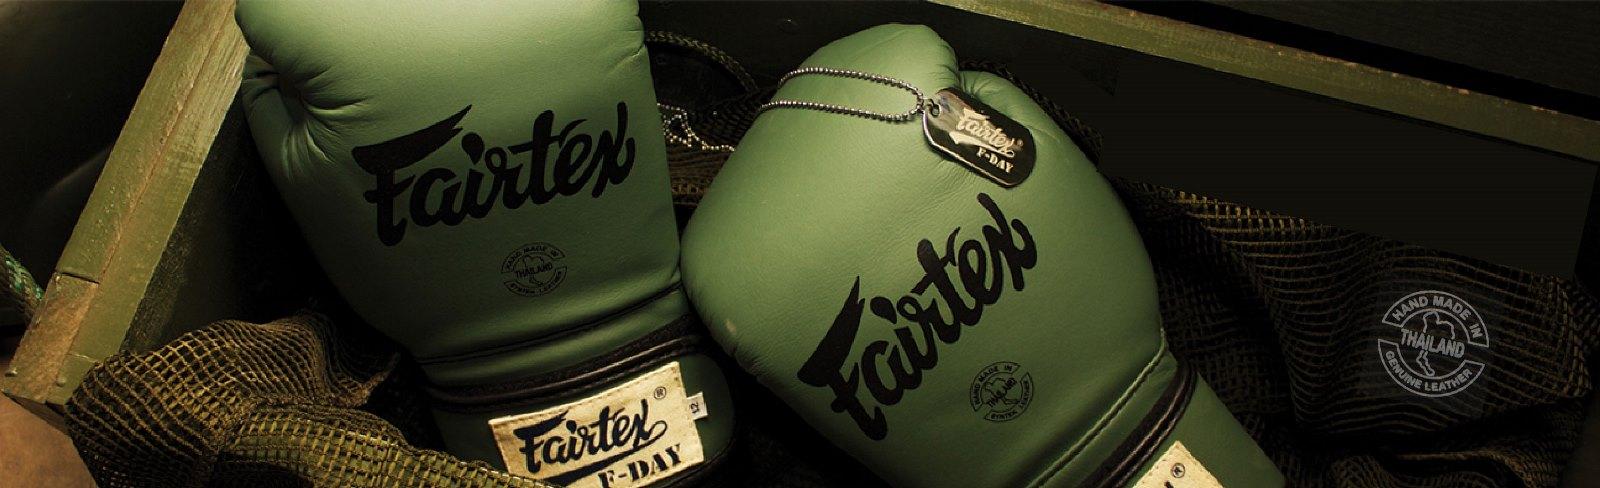 Budopunkt Fairtex Muay Thai equipment